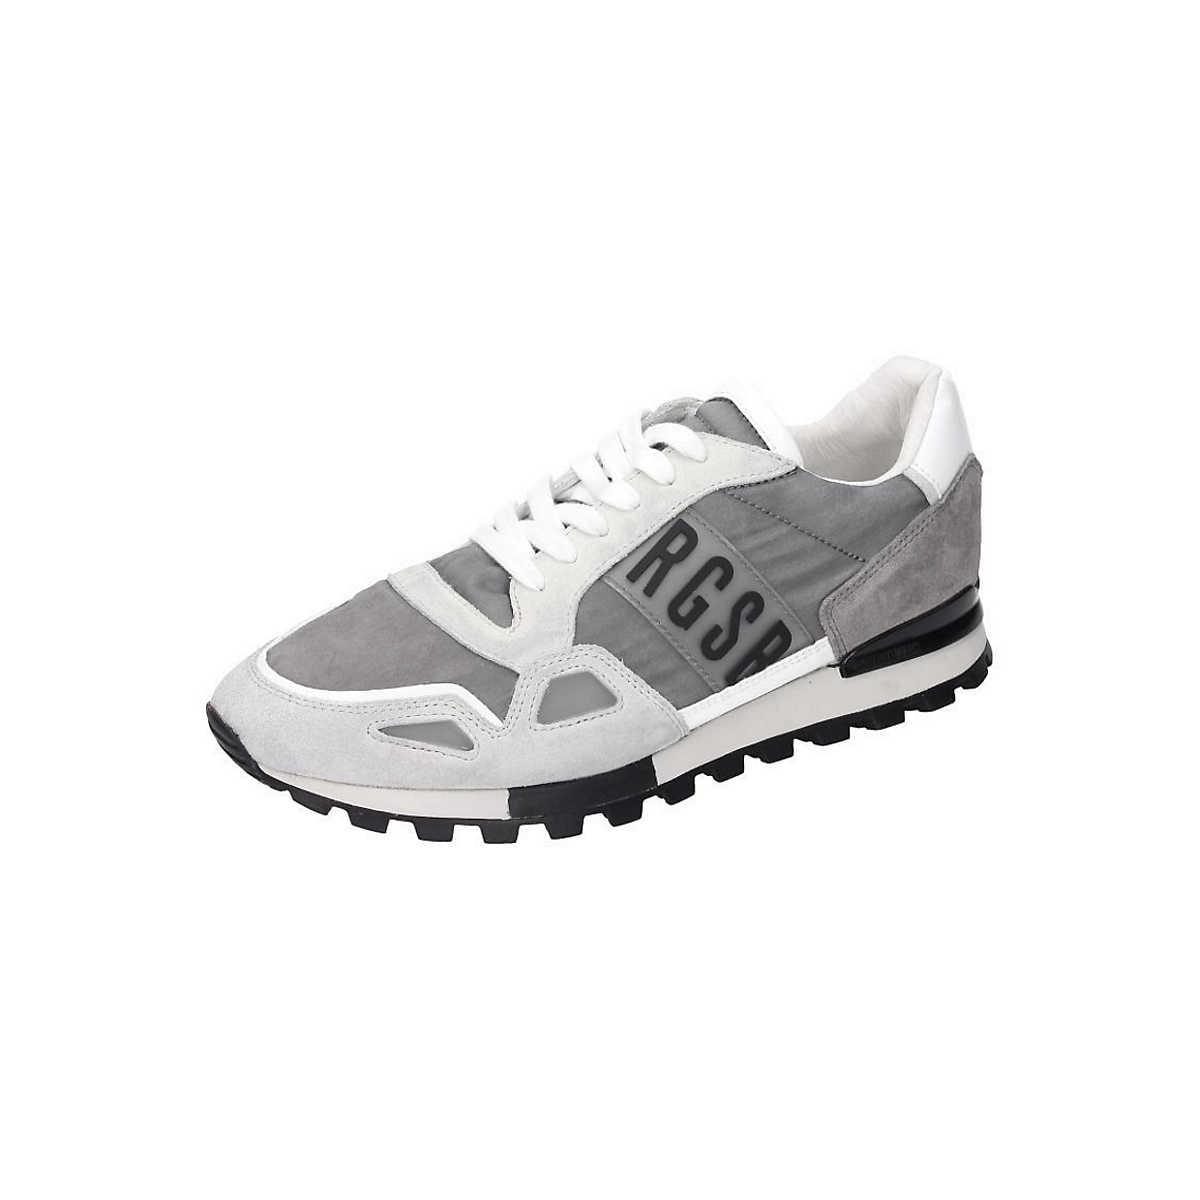 Bikkembergs Sneakers grau-kombi - Bikkembergs - Sneakers - Schuhe - mirapodo.de